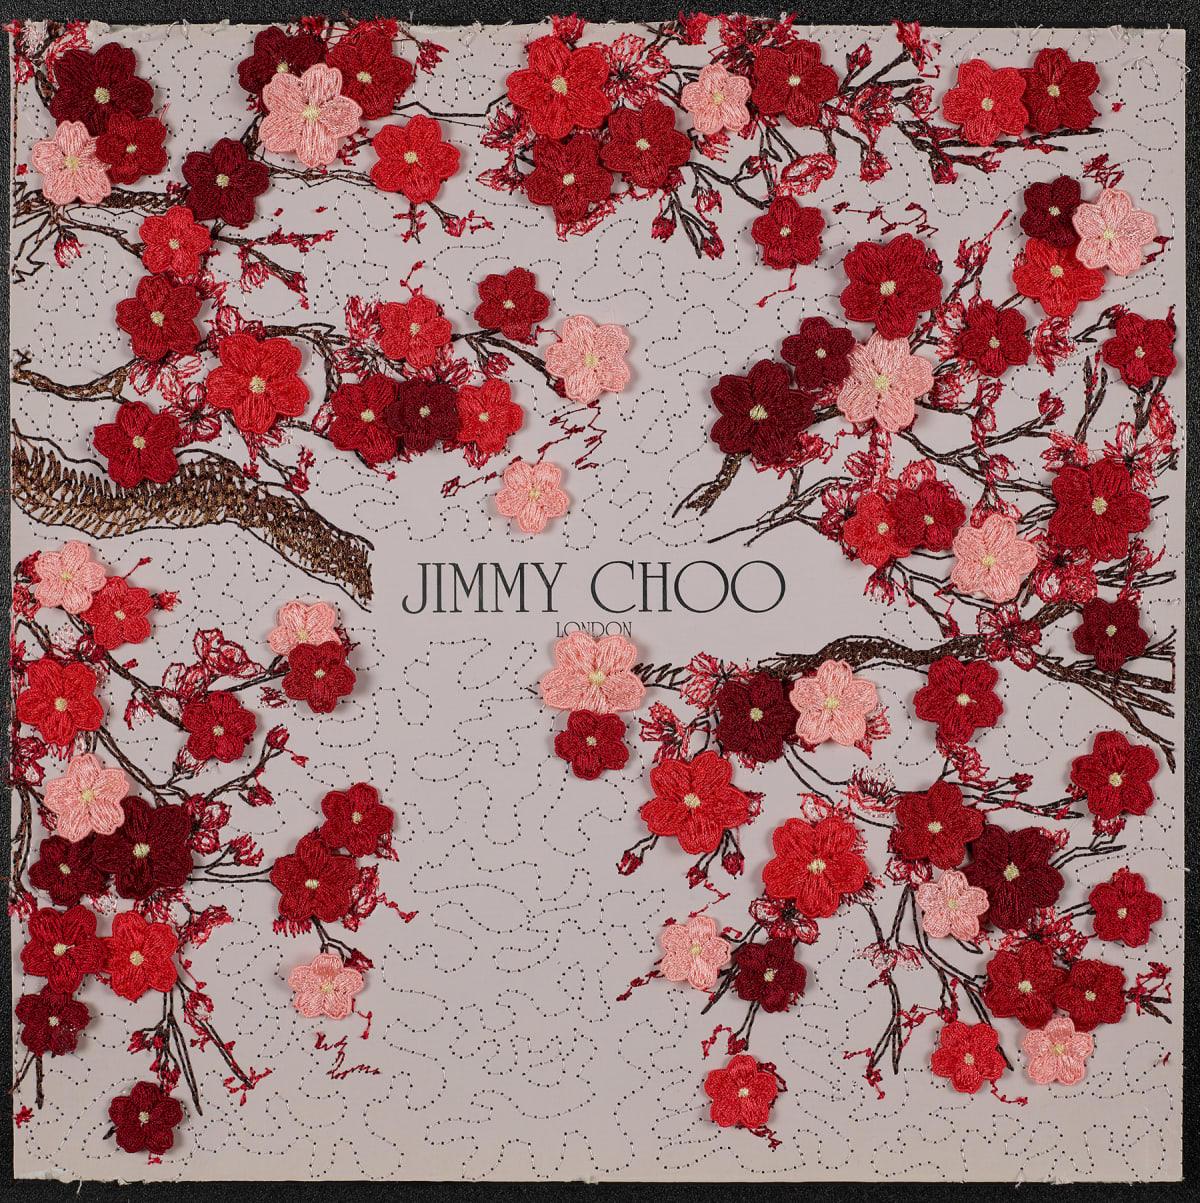 Stephen Wilson, Jimmy Choo Crimson Cherry, 2020